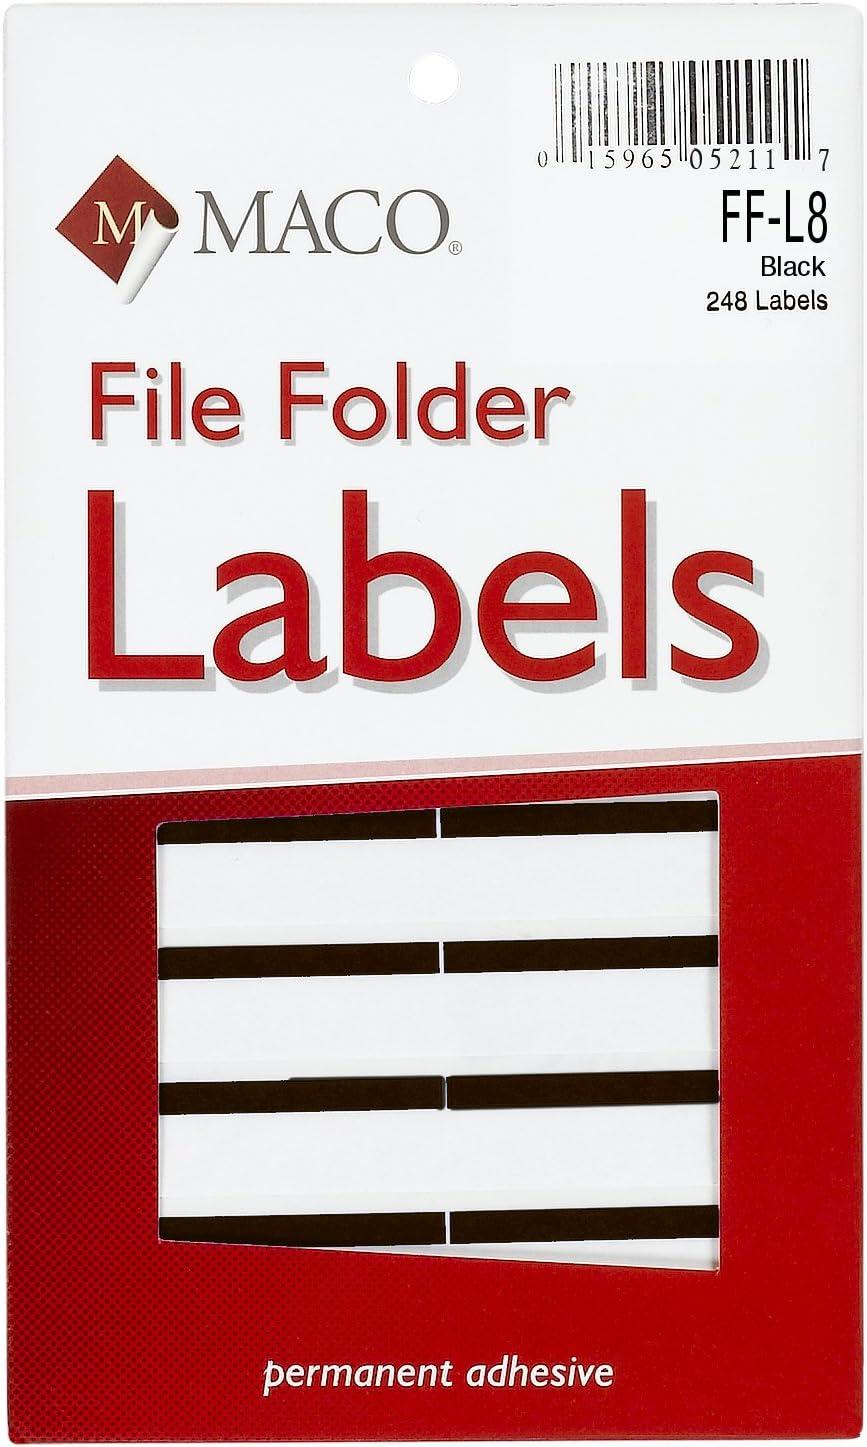 MACO Black File Folder Labels, 9/16 x 3-7/16 Inches, 248 Per Box (FF-L8) : Office Products